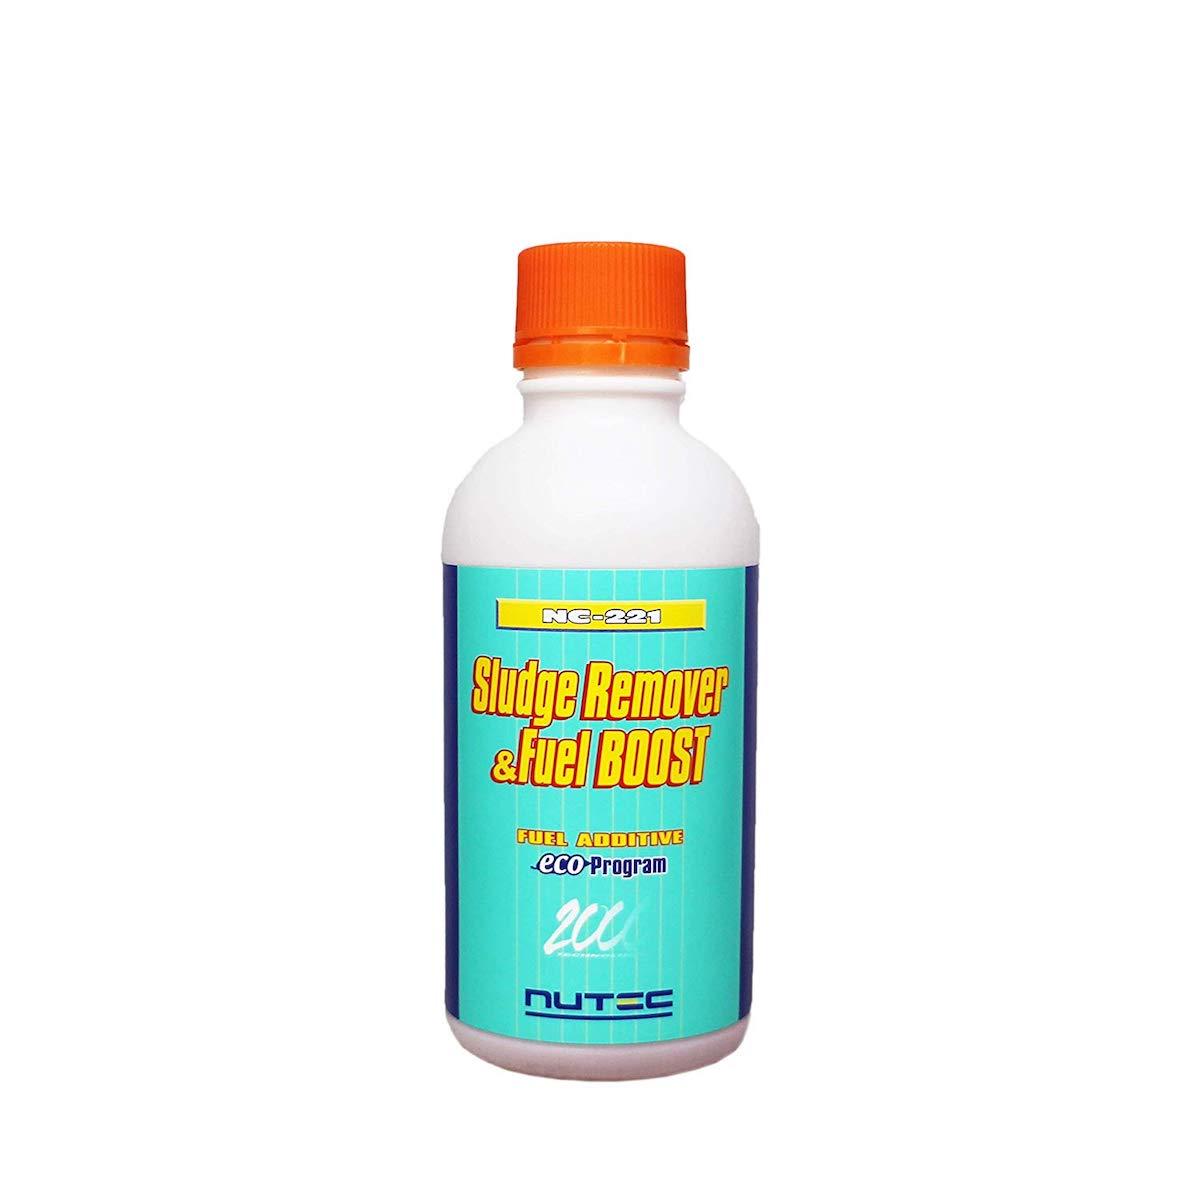 NUTEC NC-221綜效均衡型燃油精華液